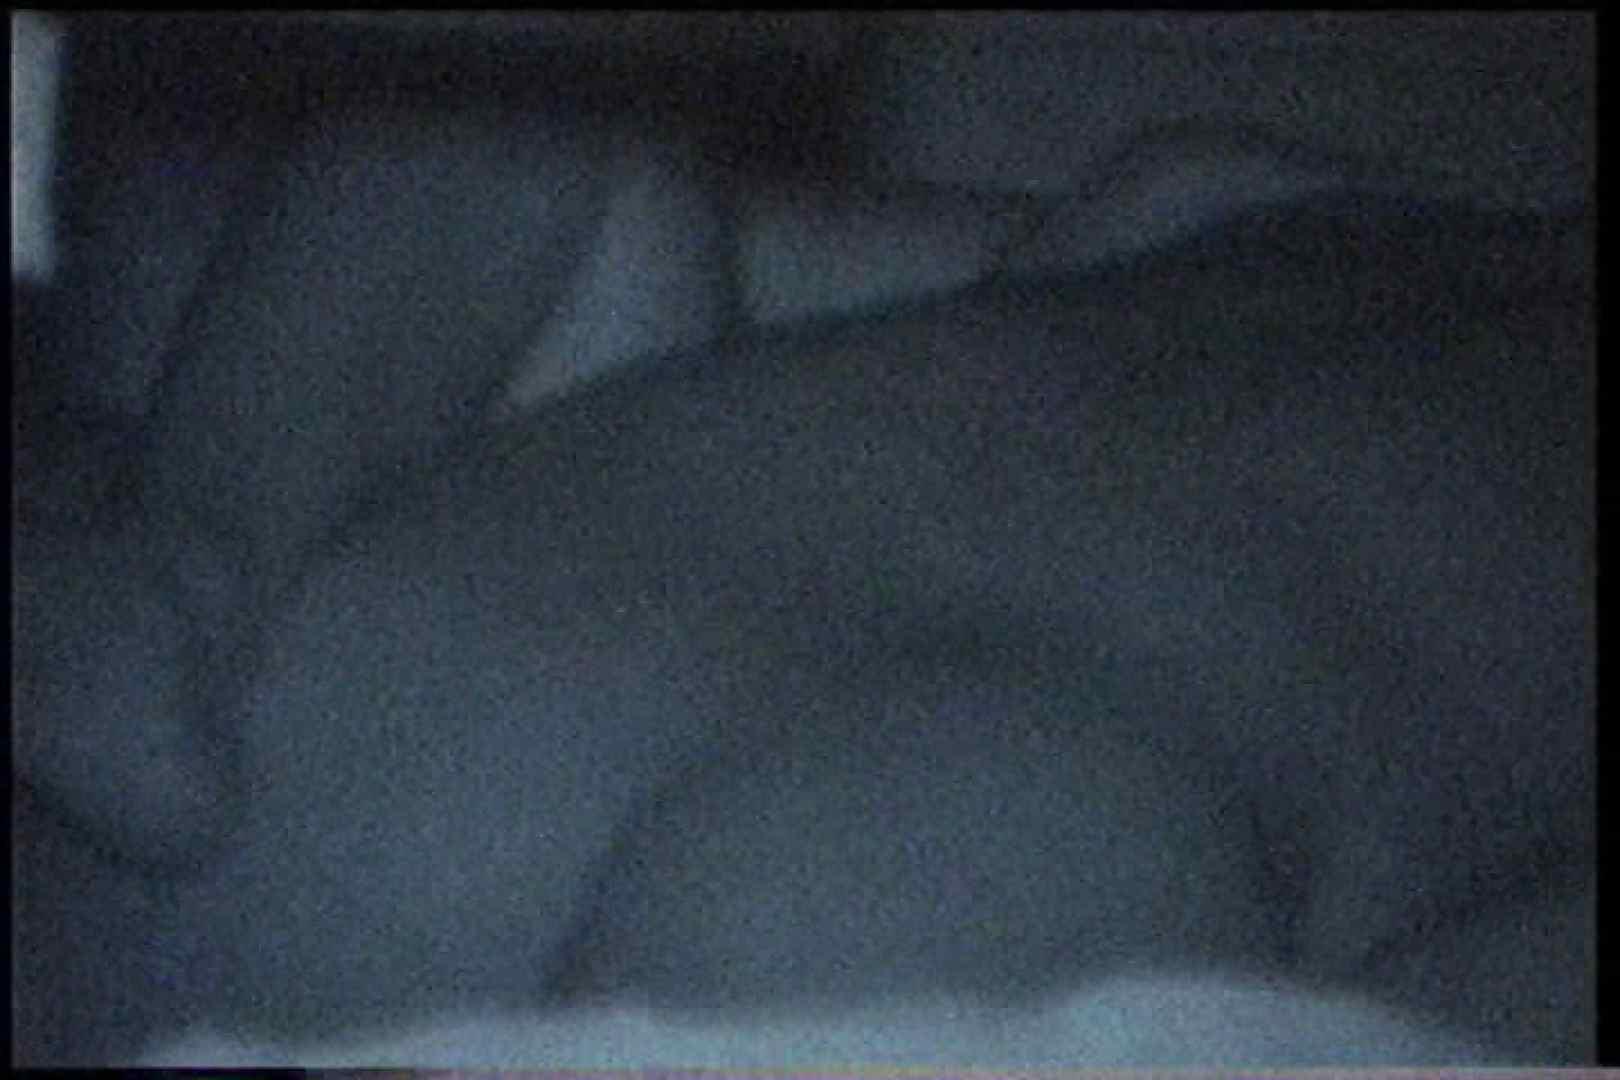 充血監督の深夜の運動会Vol.169 美女OL エロ無料画像 62連発 10